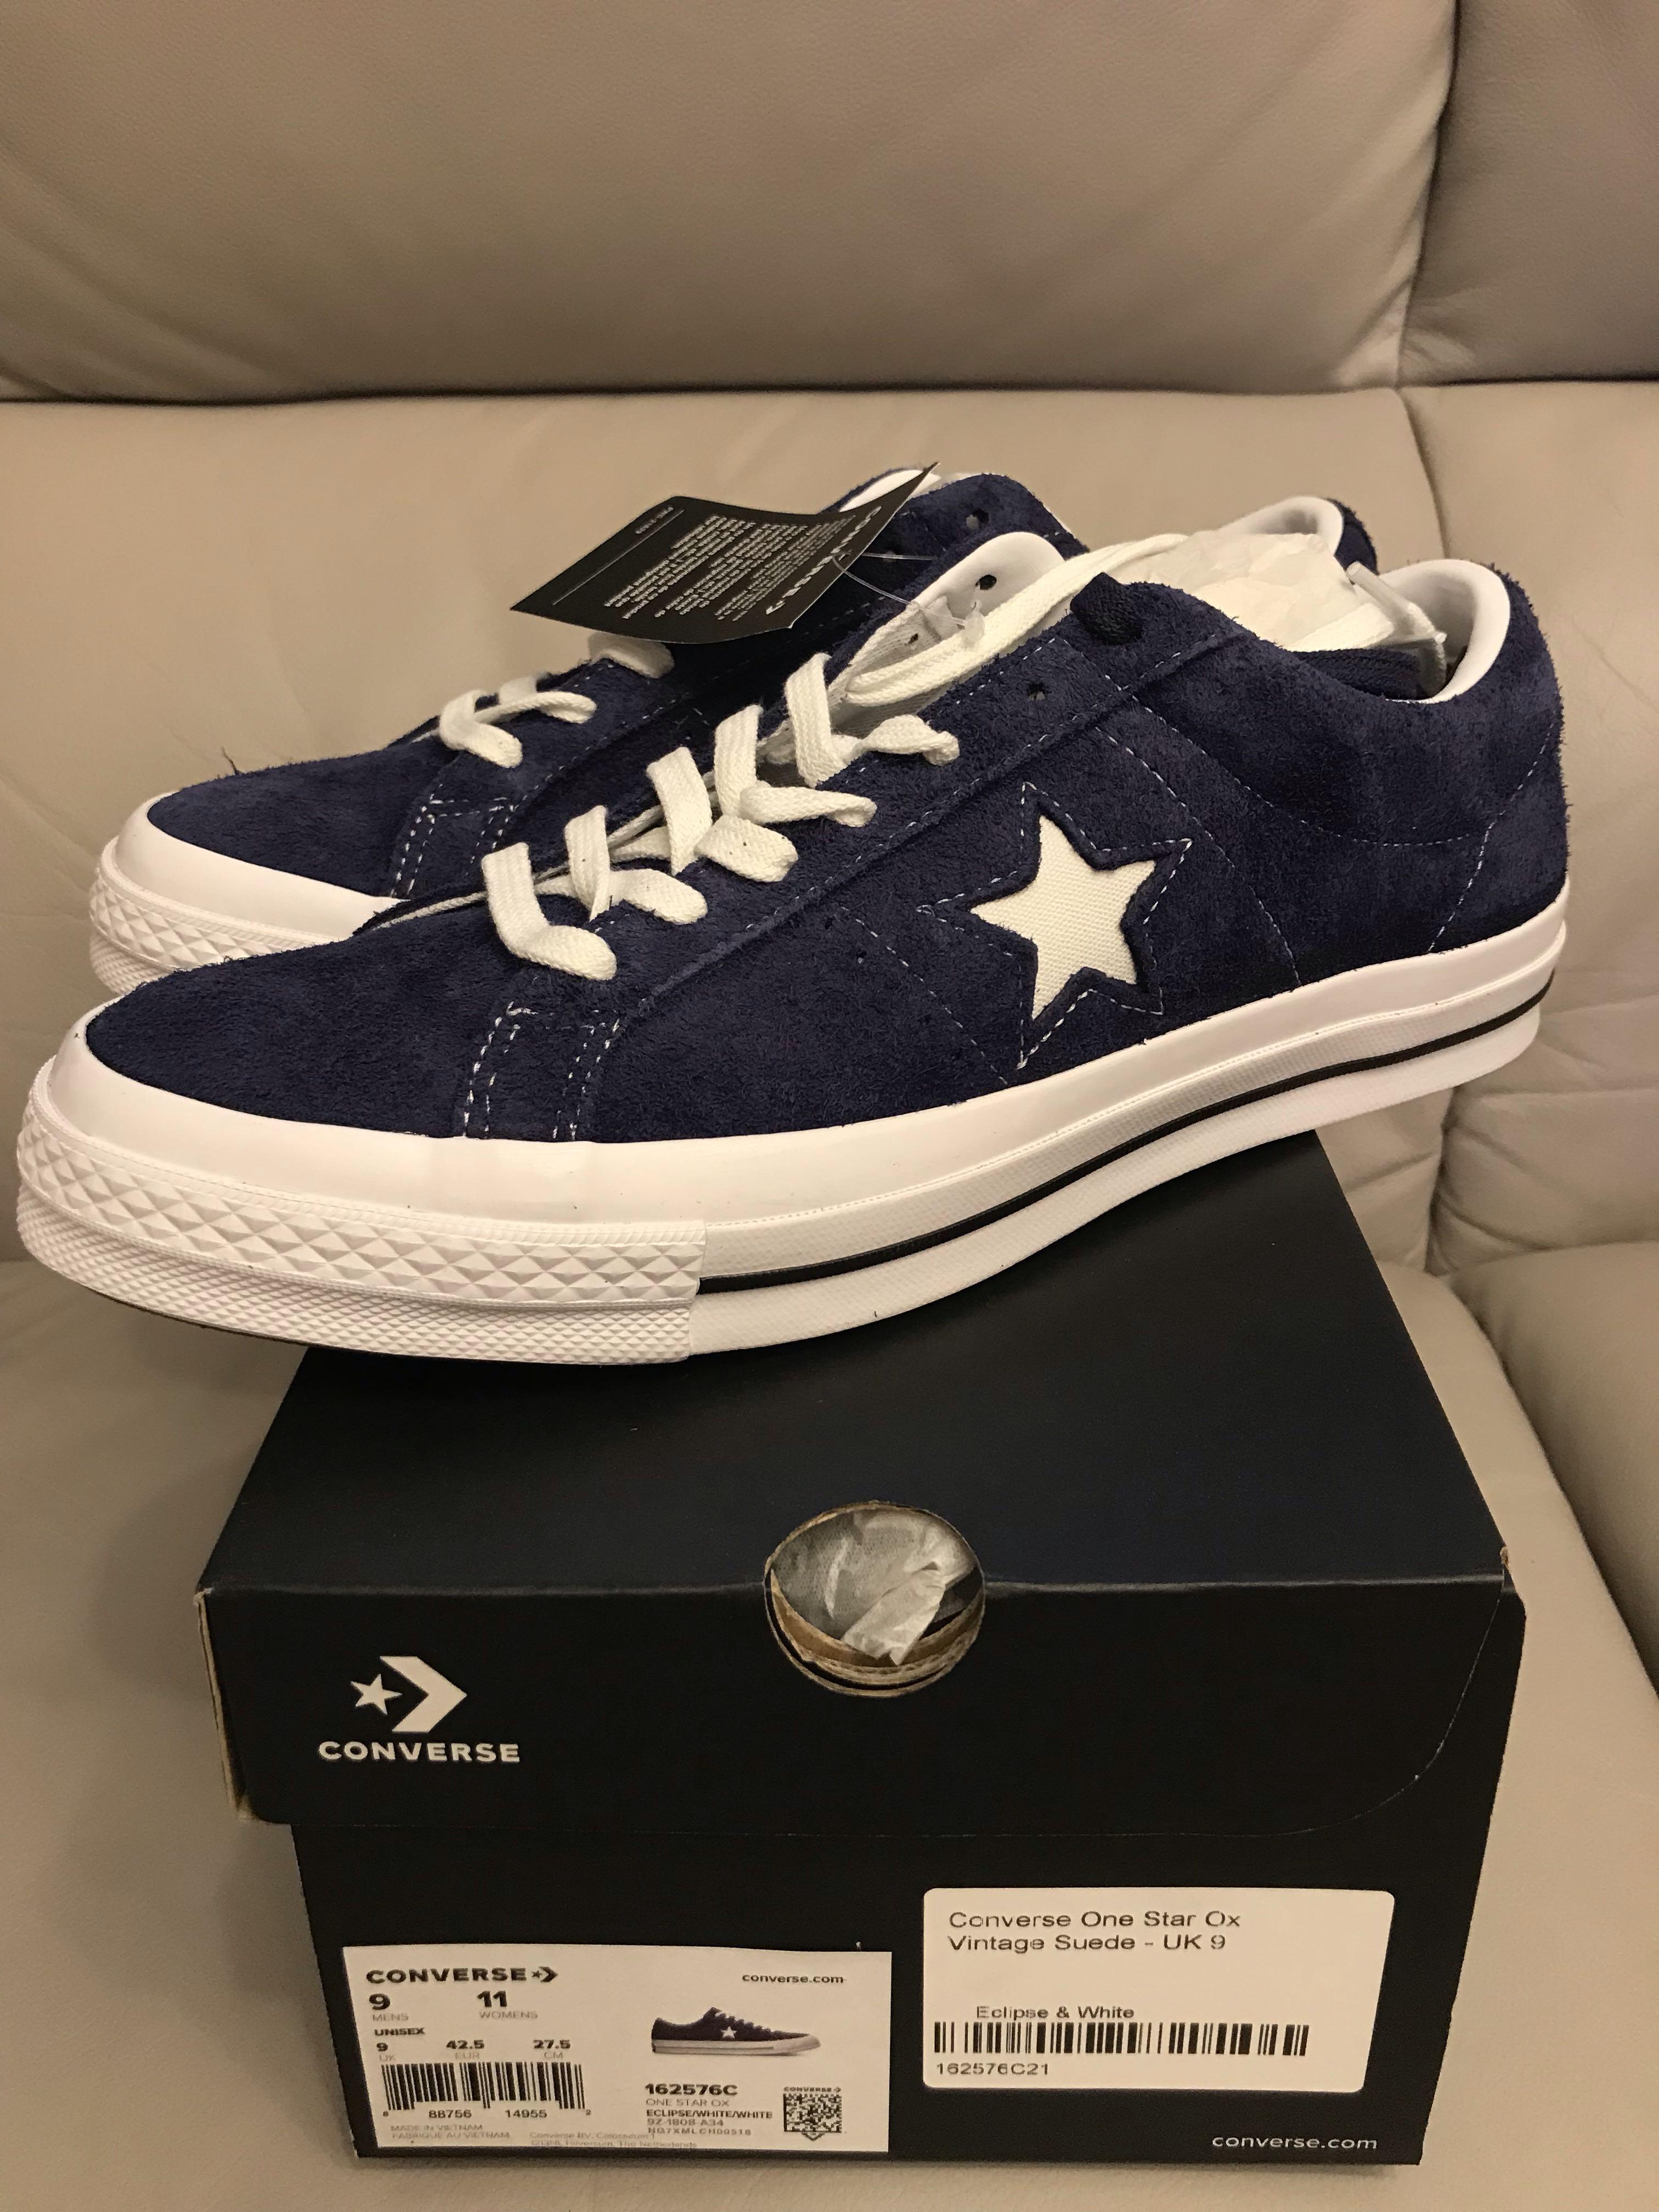 全新converse one star ox vintage suede